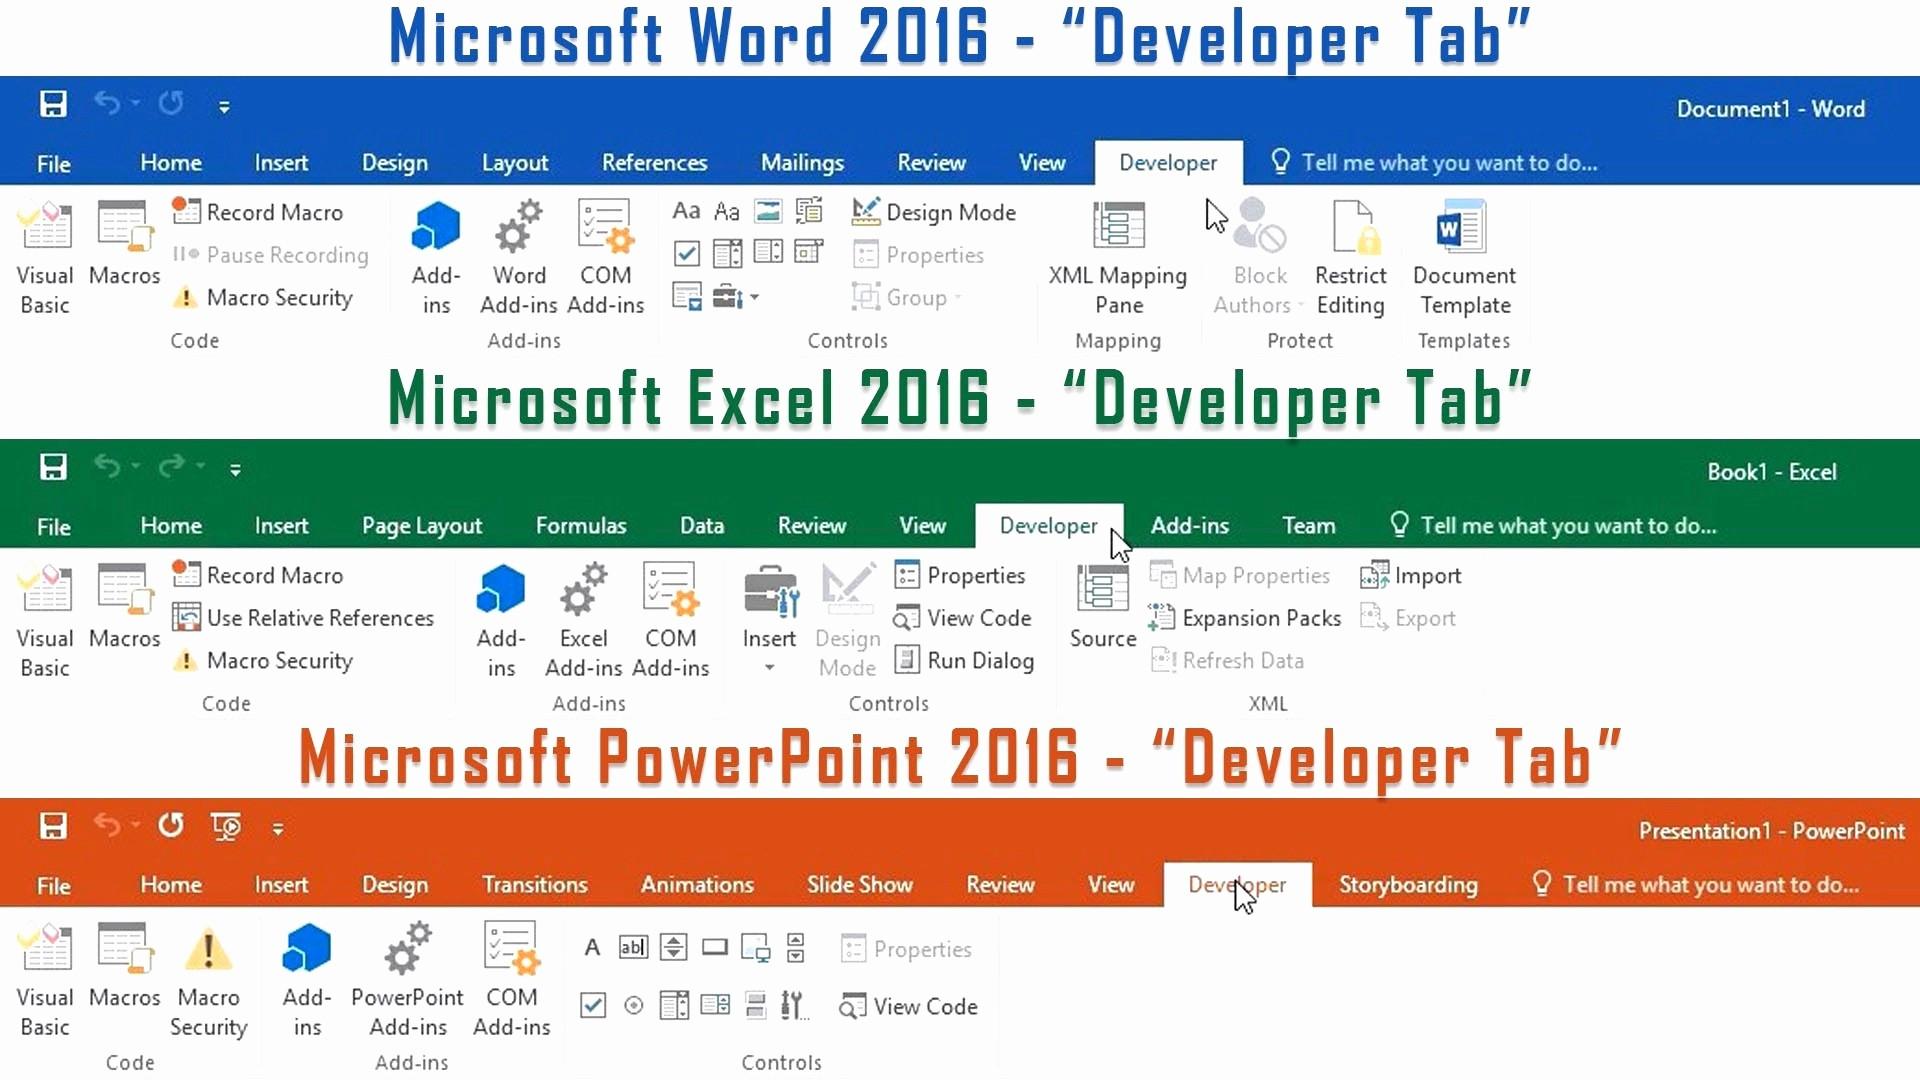 Spreadsheet Tools For Engineers Using Excel 2007 Ebook Intended For Spreadsheet Tools For Engineers Using Excel 2007 Ebook